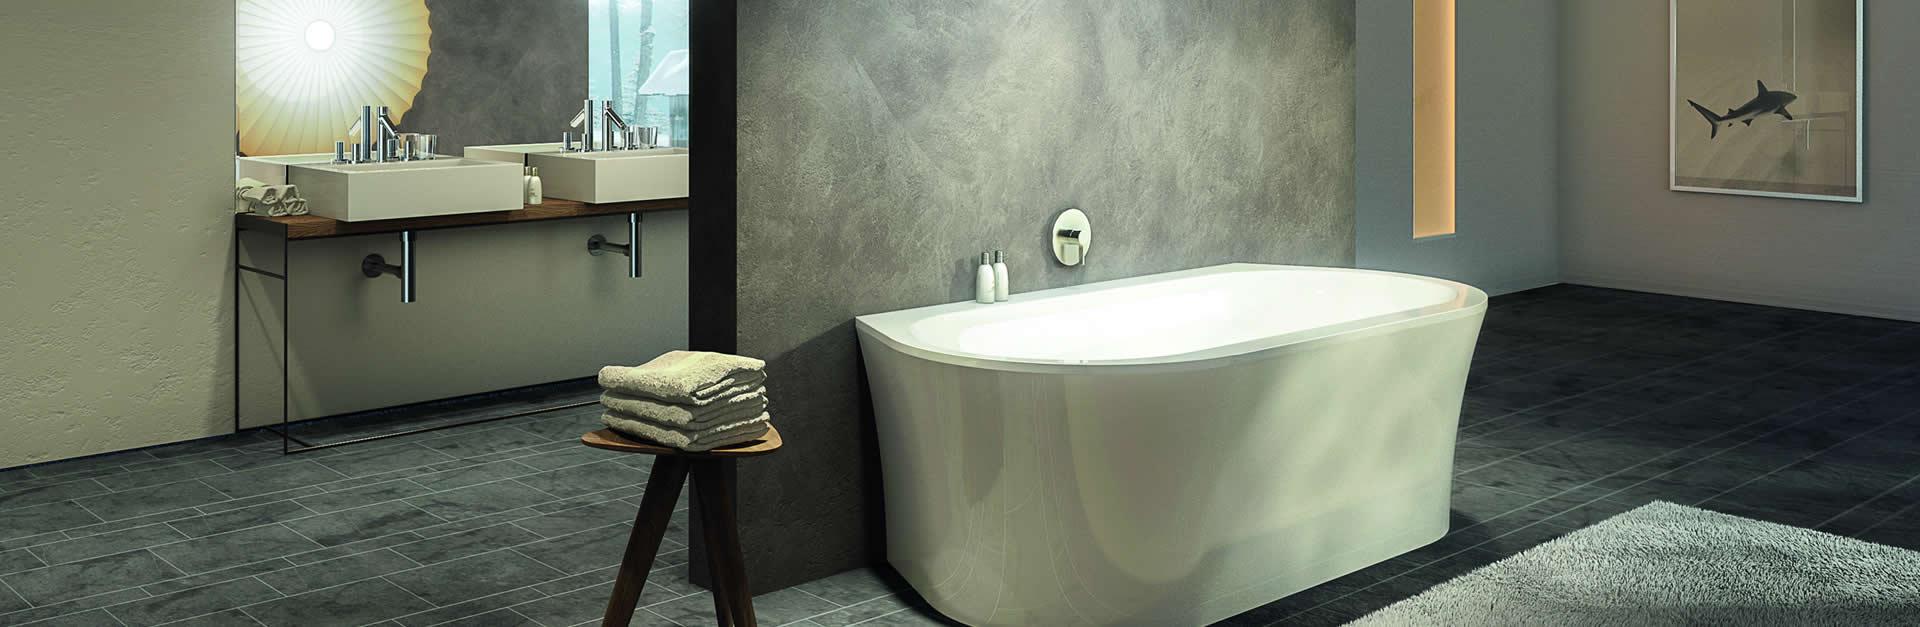 bill haustechnik ag. Black Bedroom Furniture Sets. Home Design Ideas